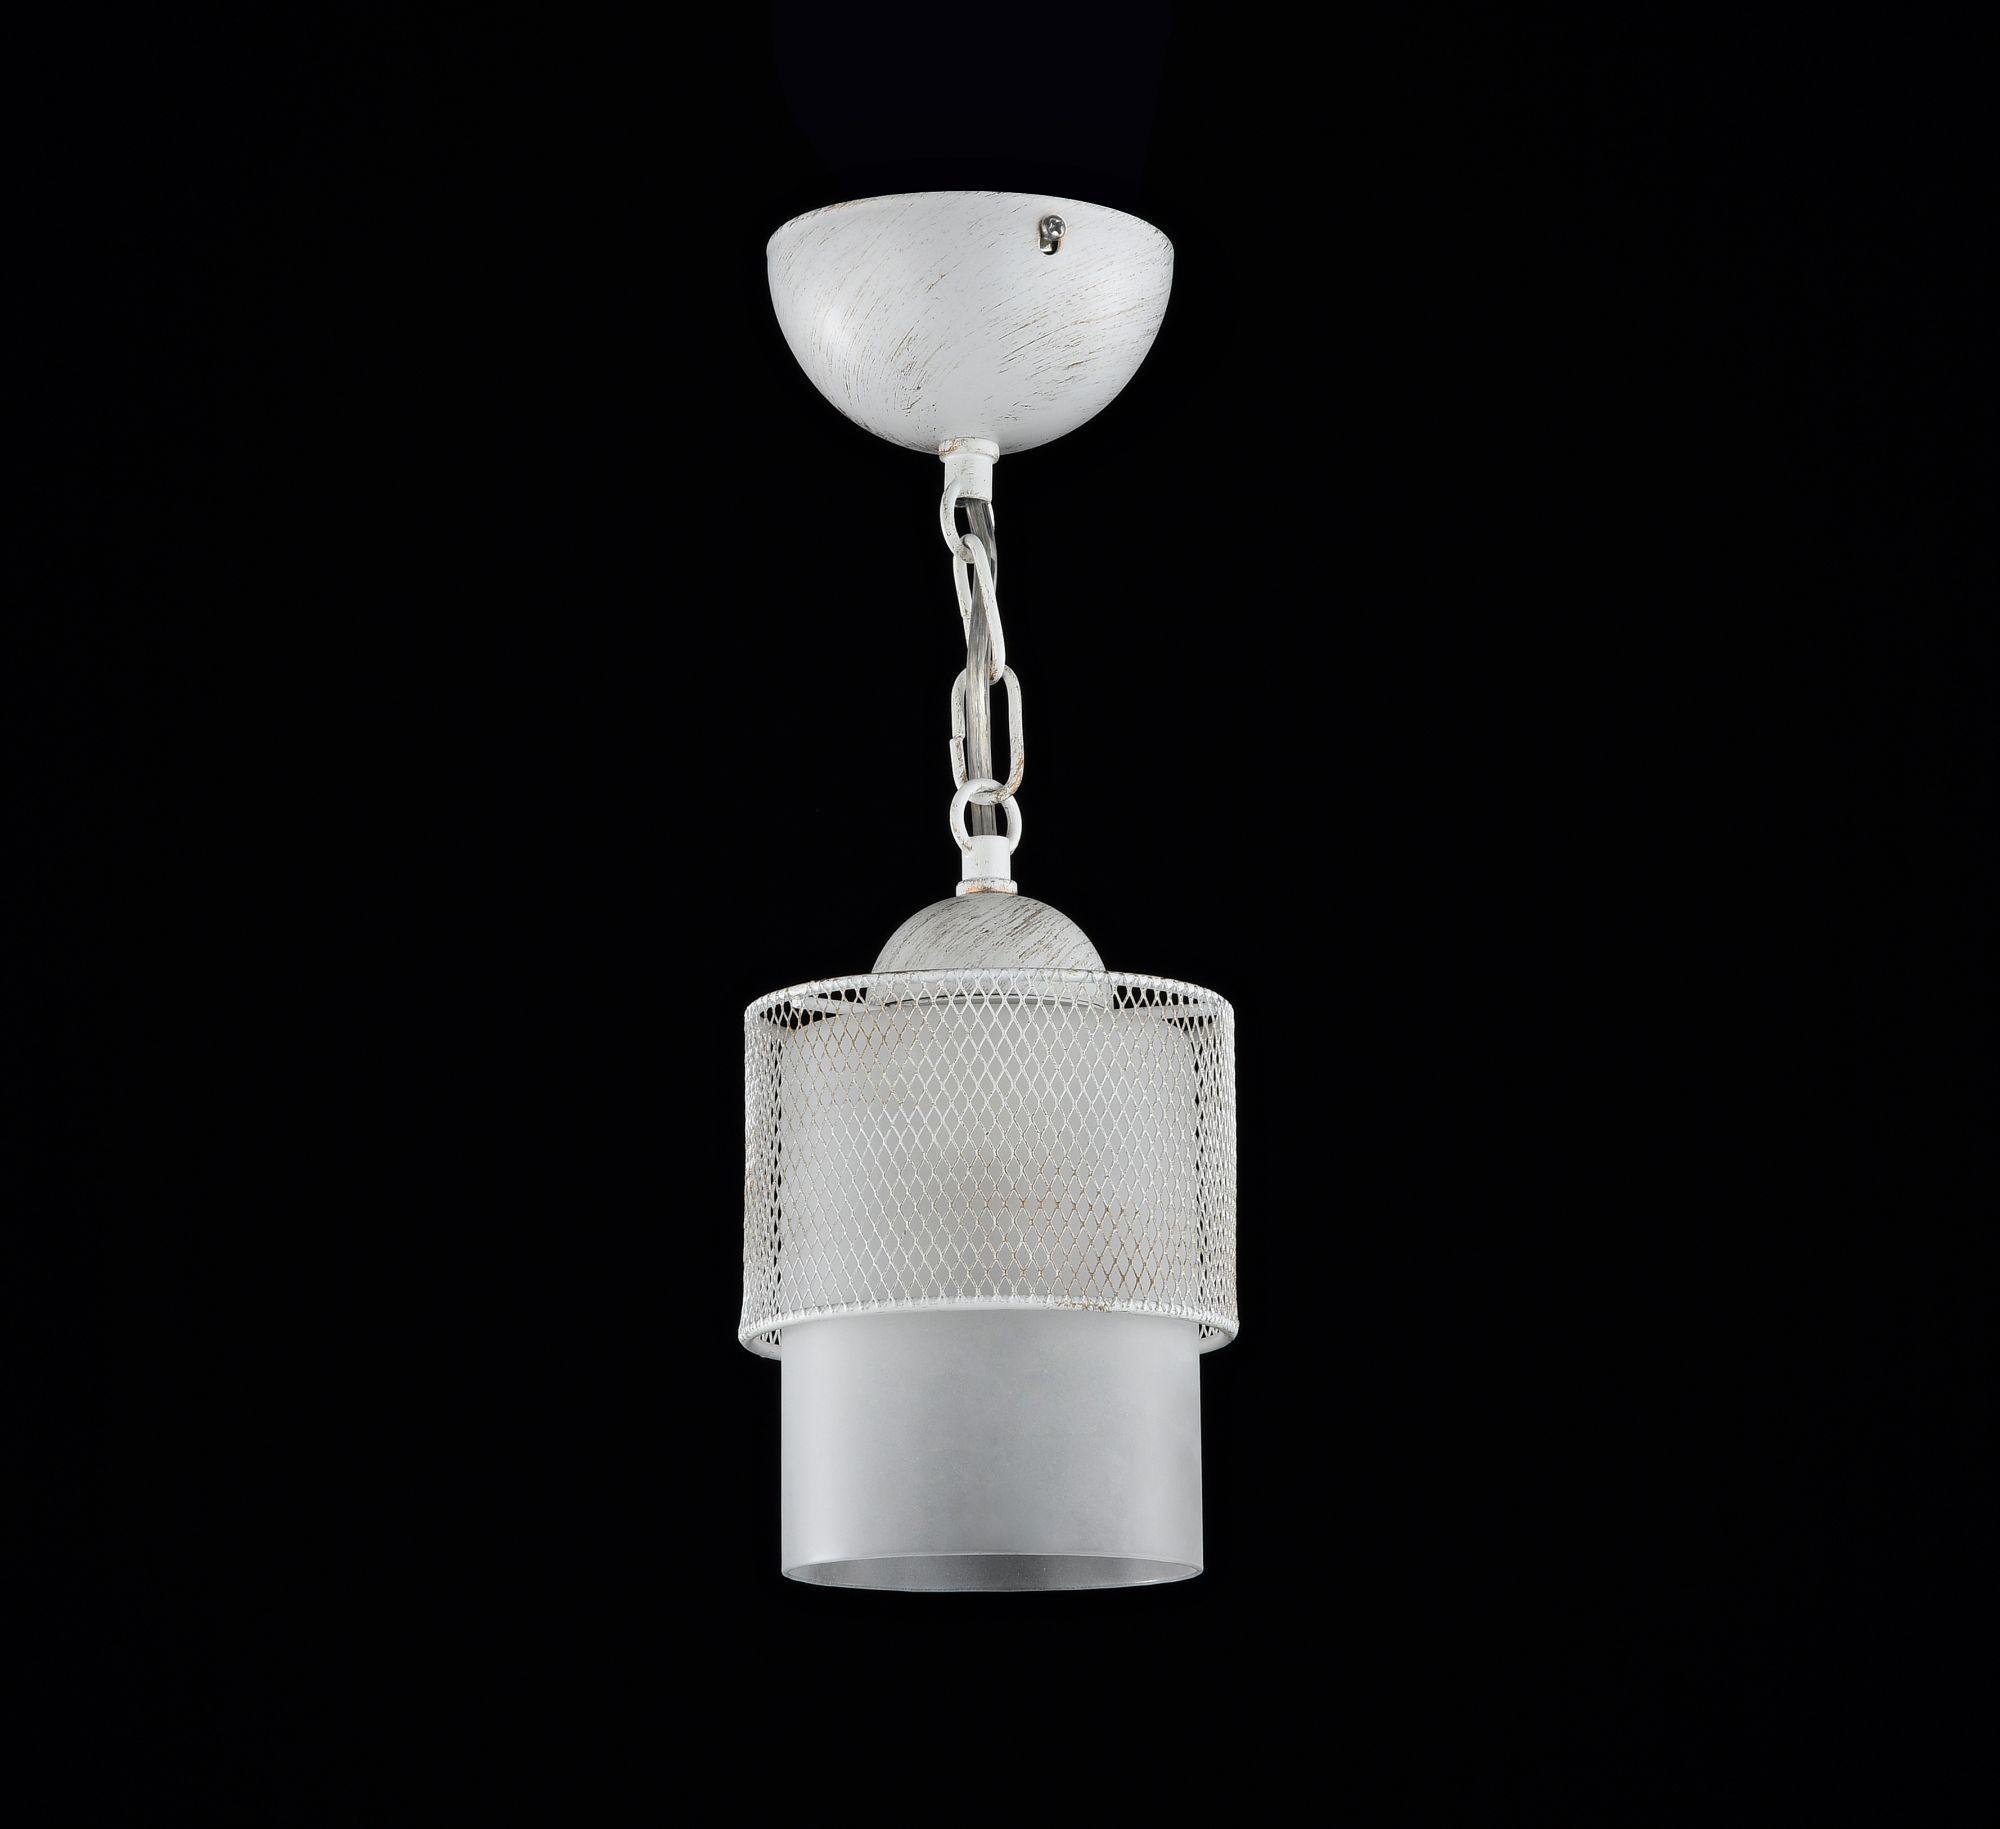 Подвесной светильник Freya Ornella FR2201-PL-01-WG (fr201-11-w), 1xE27x60W, белый, металл, металл со стеклом/пластиком - фото 2